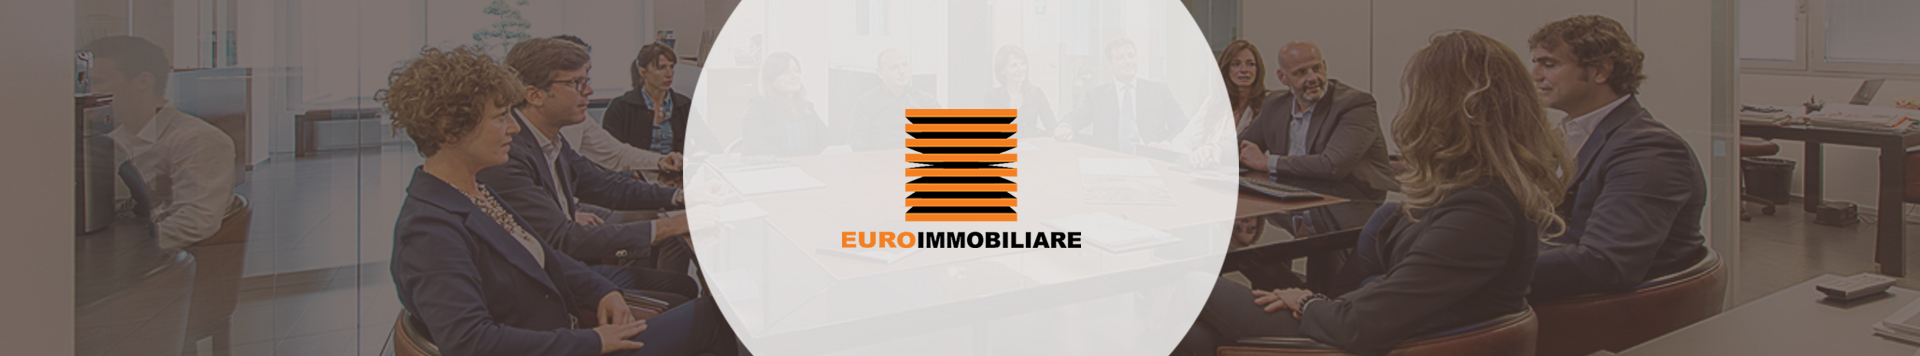 partner-euroimmobiliare